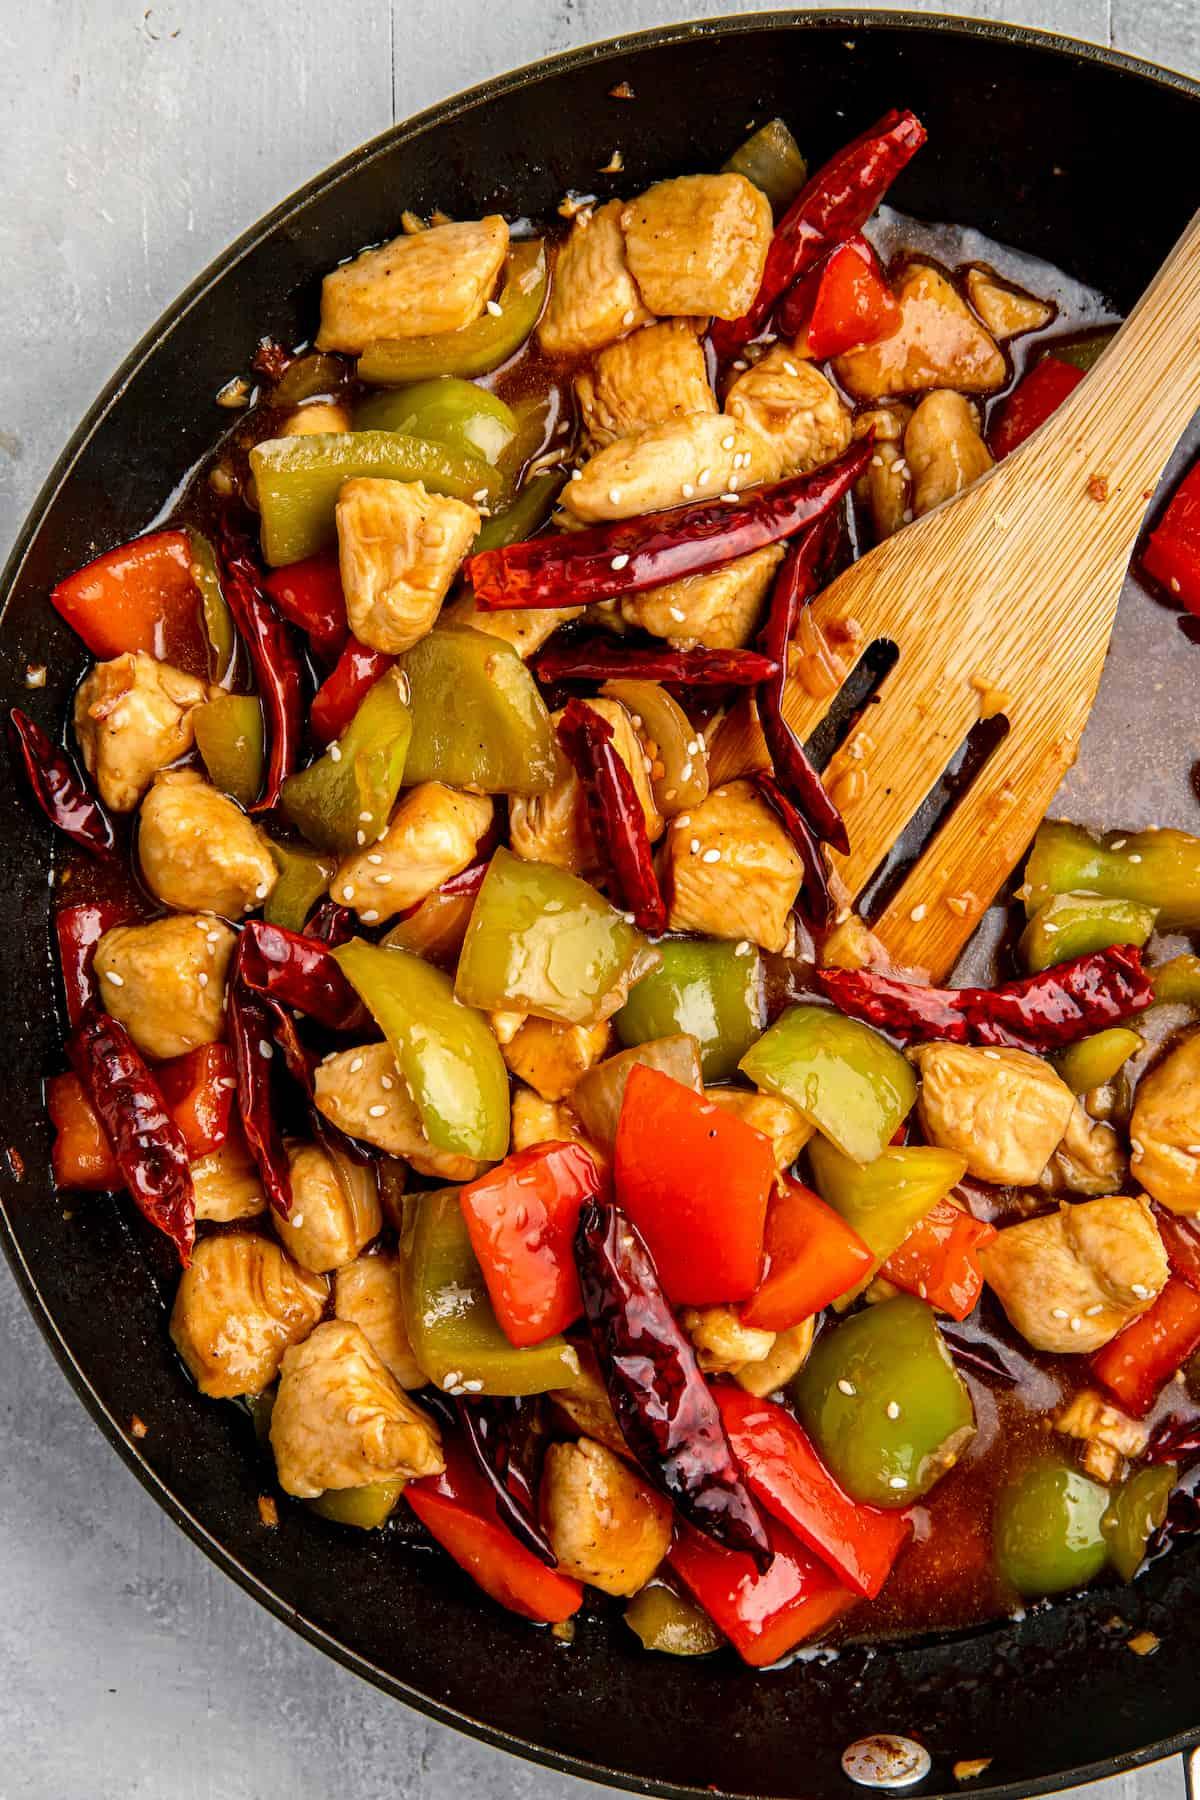 Szechuan chicken stir-fry in a cast-iron skillet with a wooden spatula.